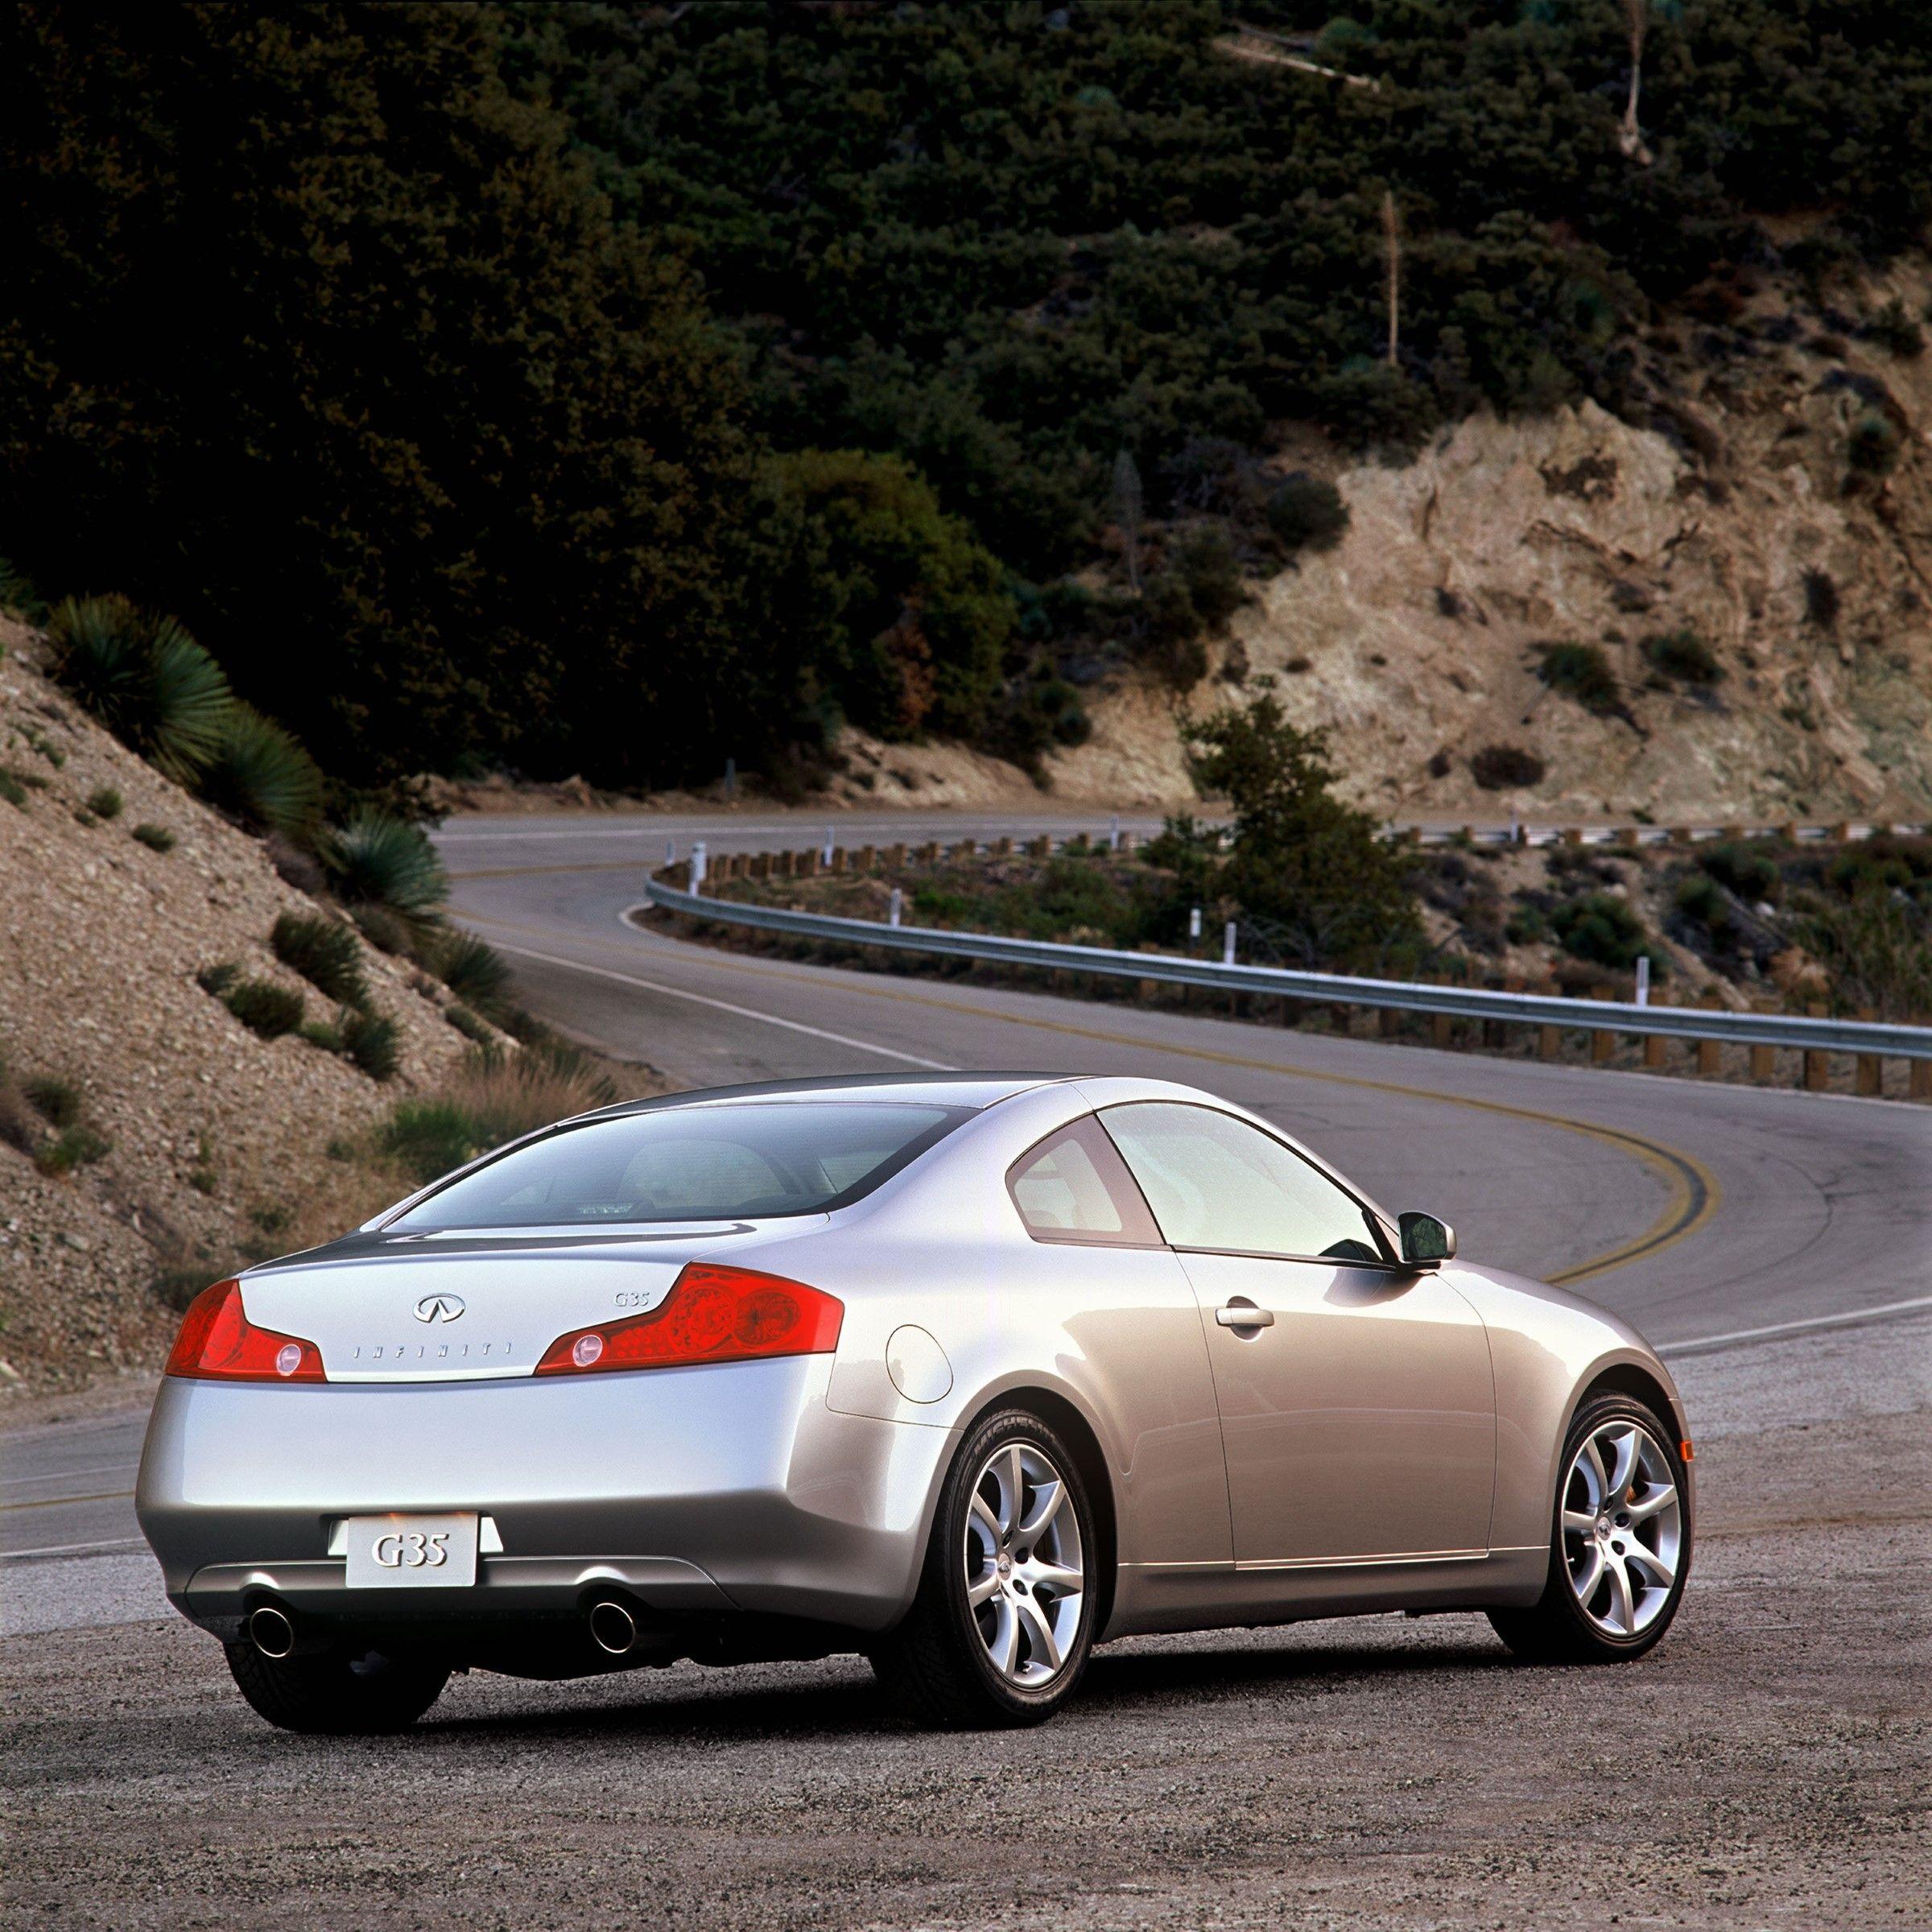 of convertible custom modern infiniti cars infinity car charm ultra pinterest wallpaper